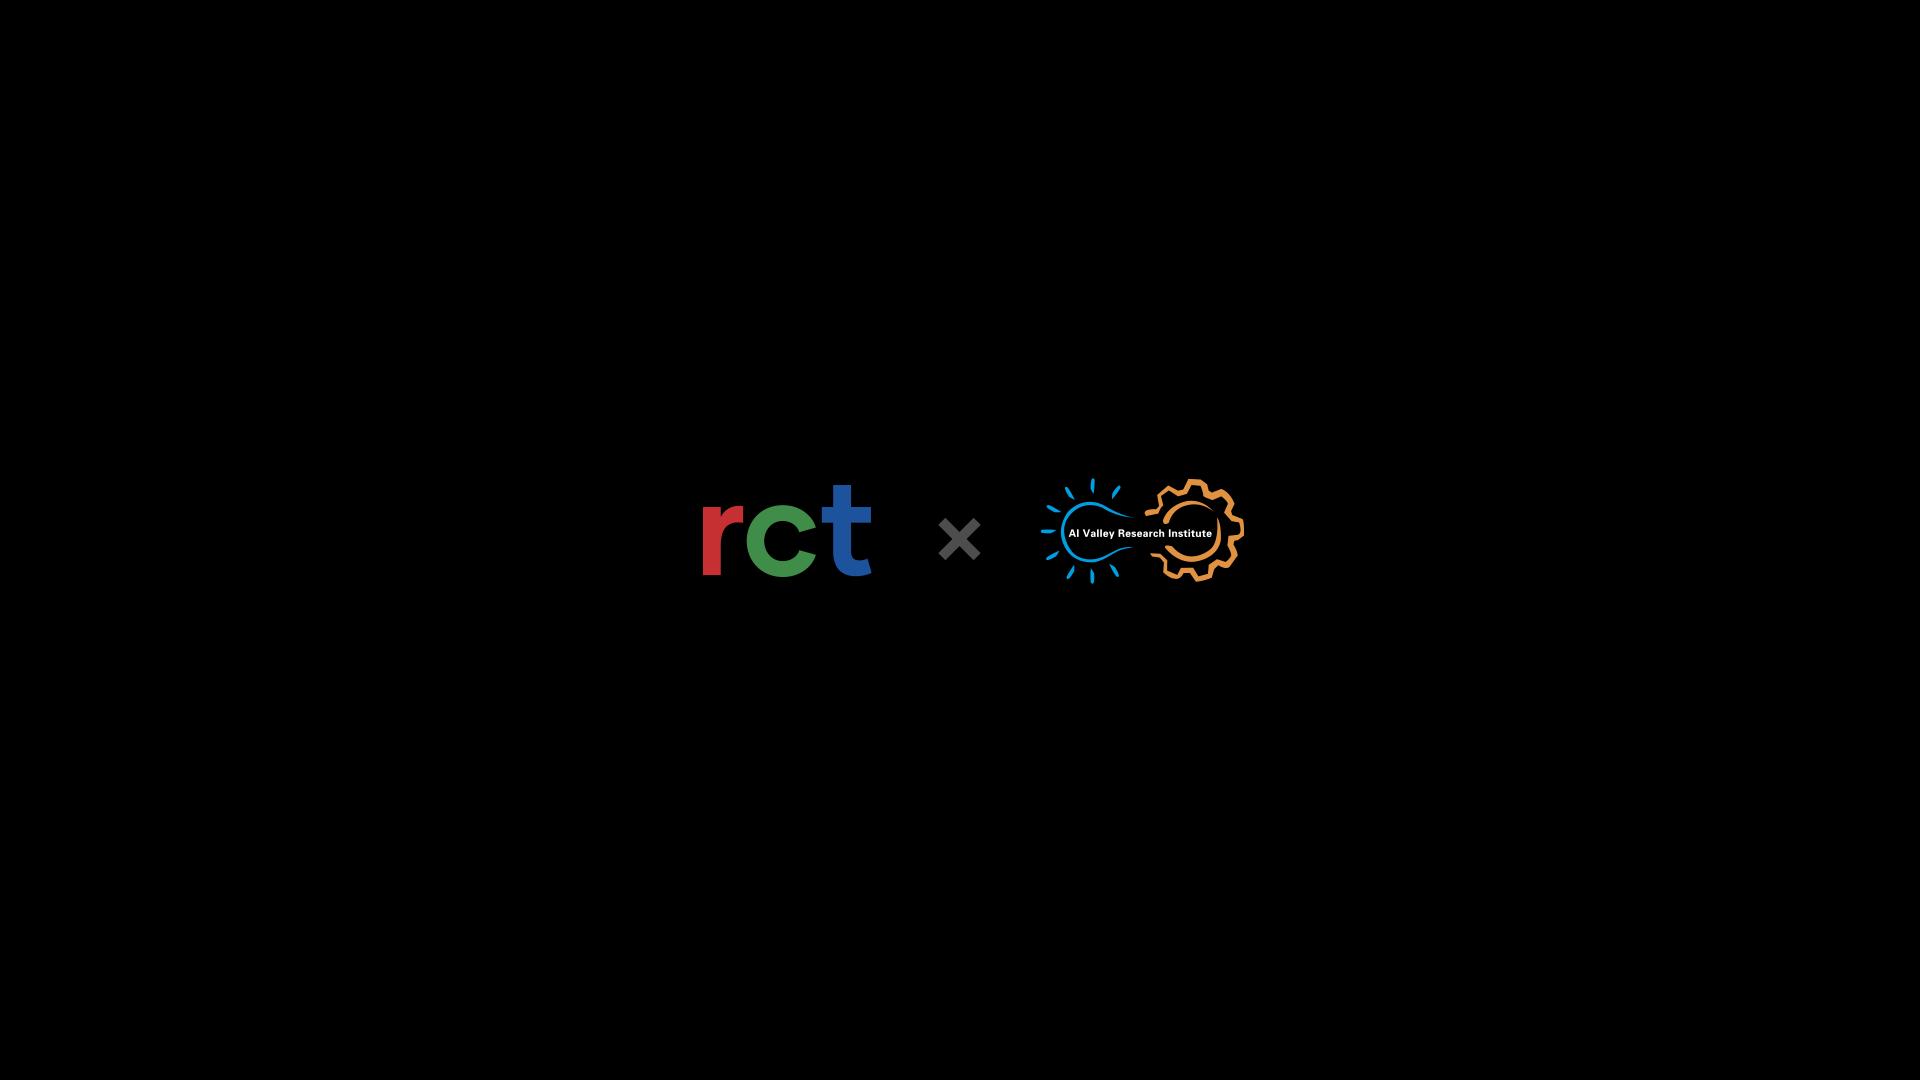 rct studio 与南京大学人工智能创新研究院签署战略合作